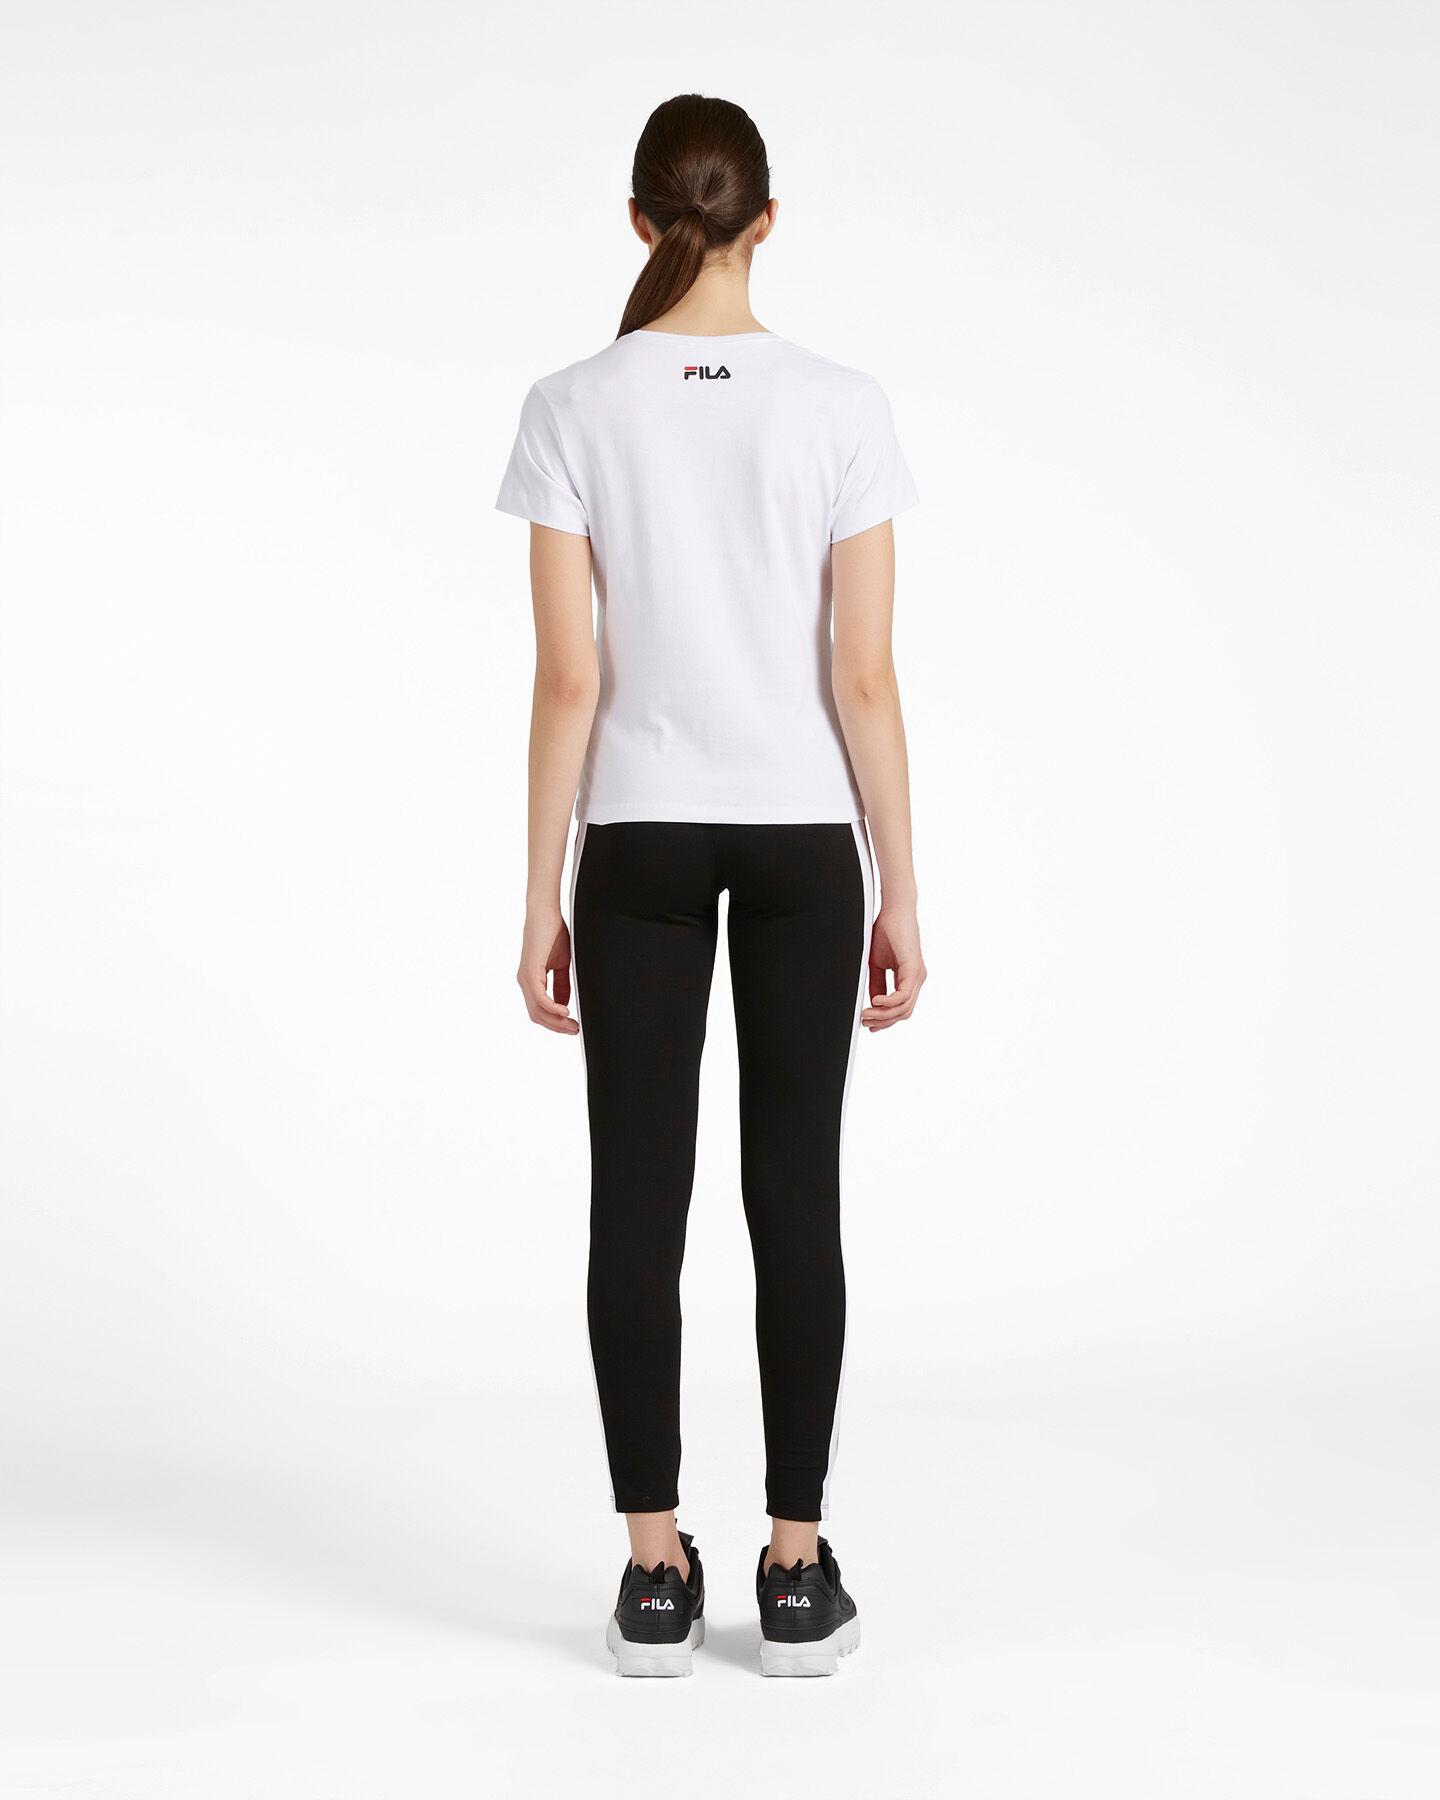 T-Shirt FILA BIG LOGO W S4088283 scatto 2